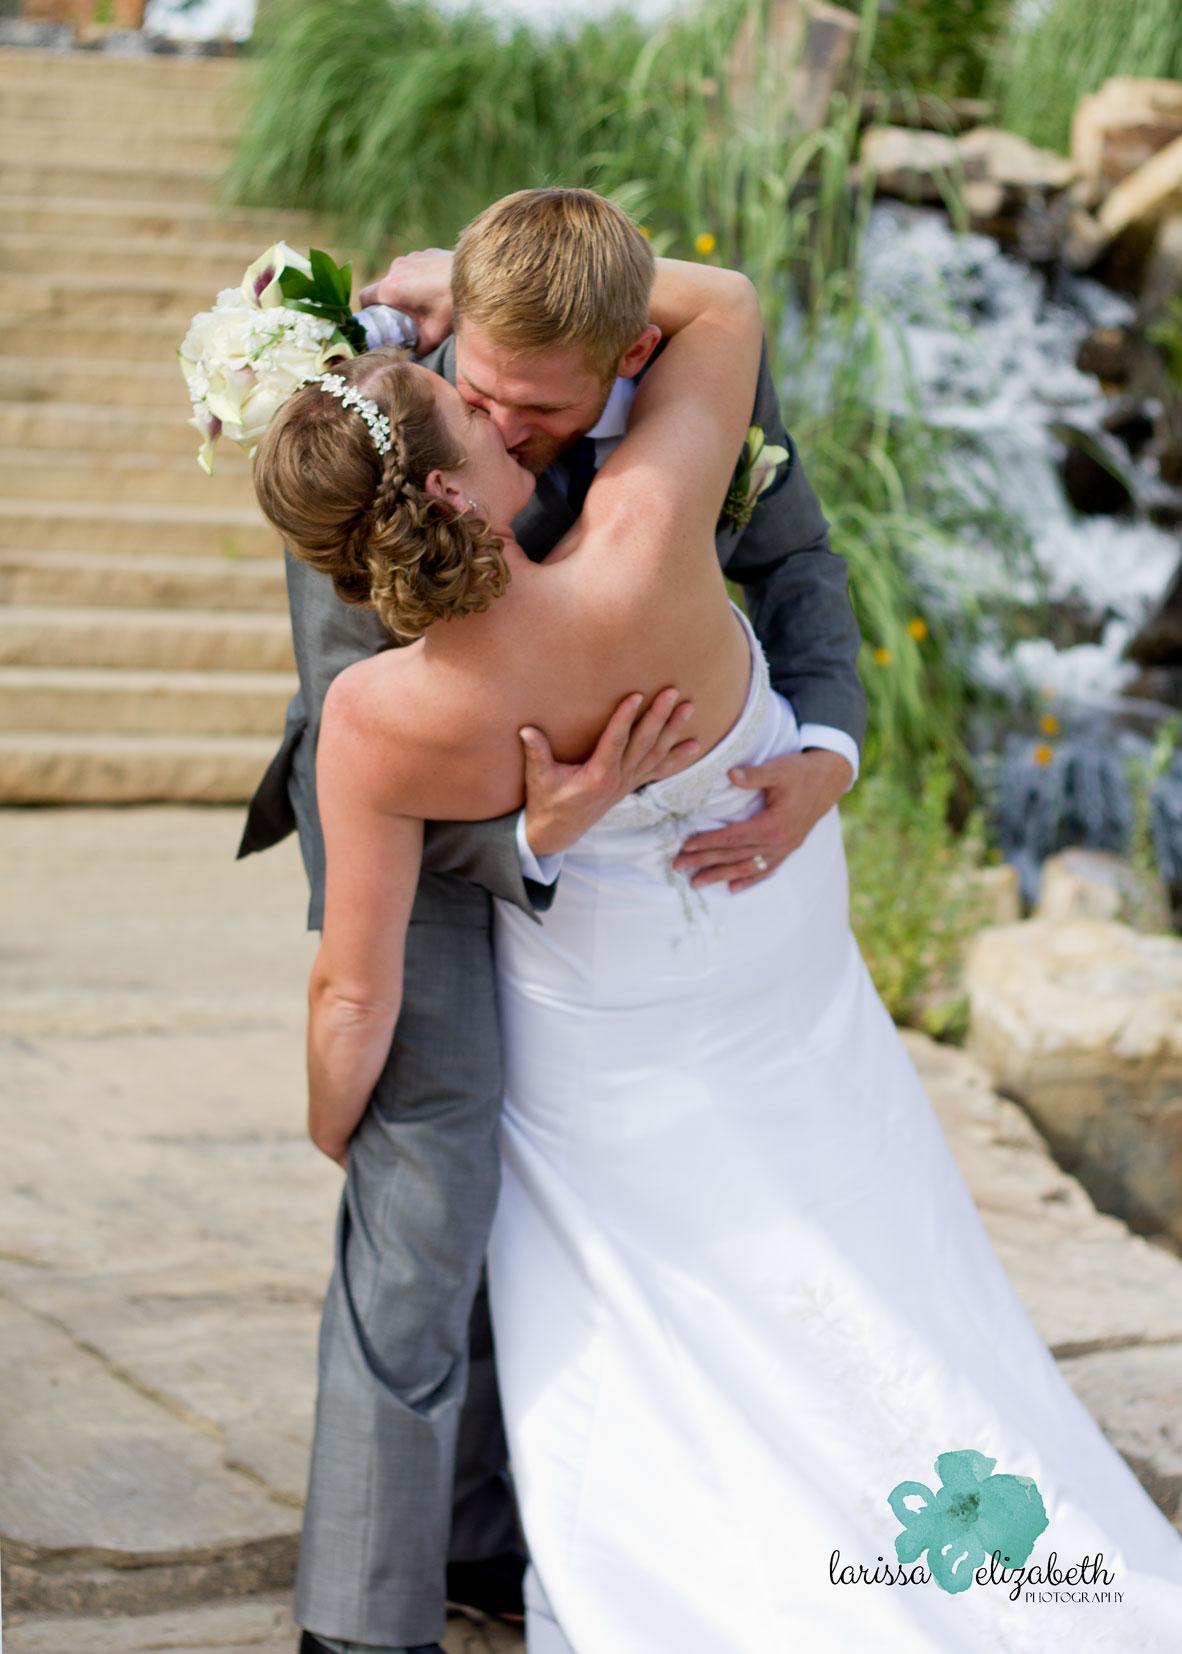 Loveland-Country-Wedding-10